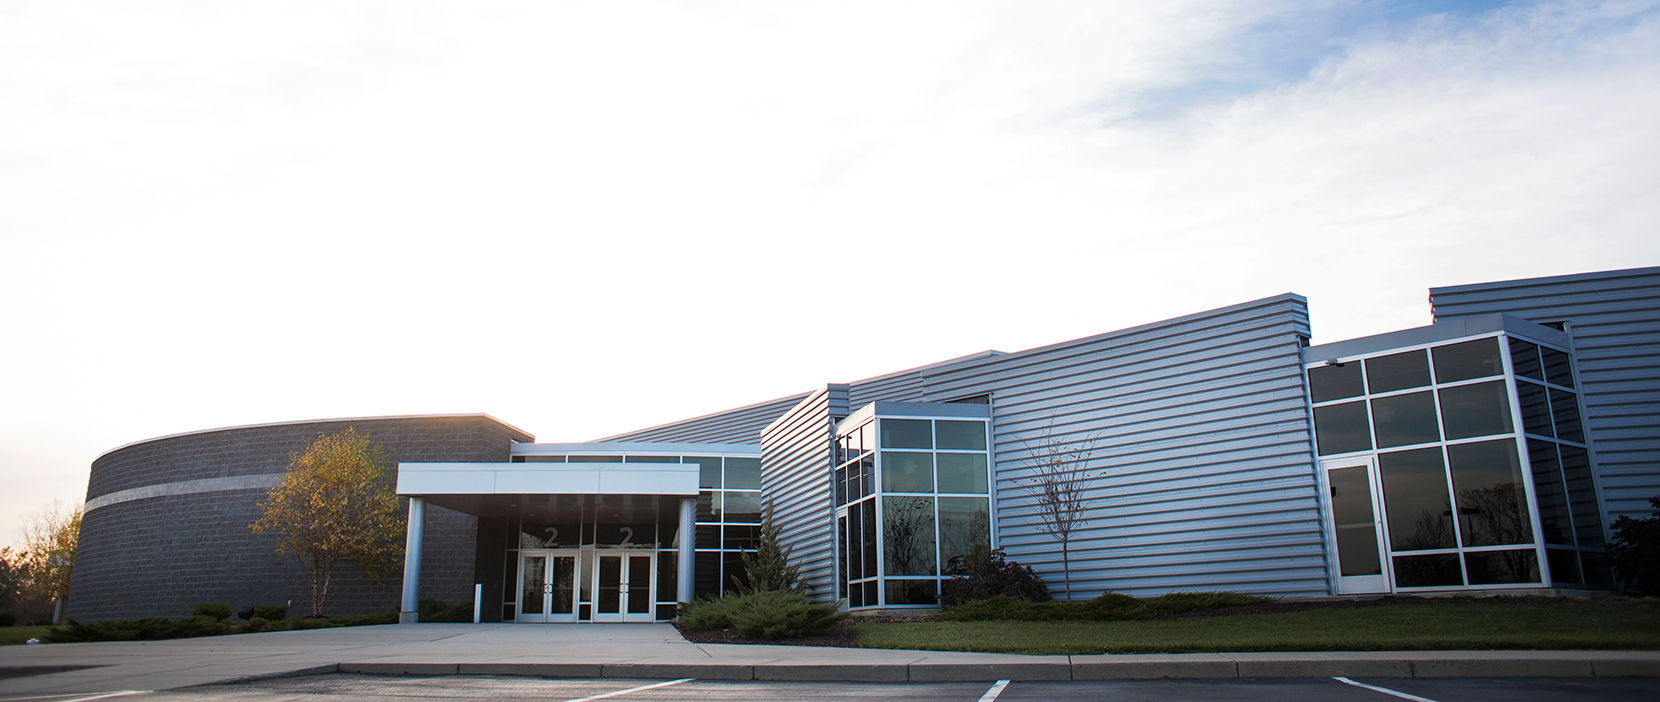 Main image for Riv's Holt Venue